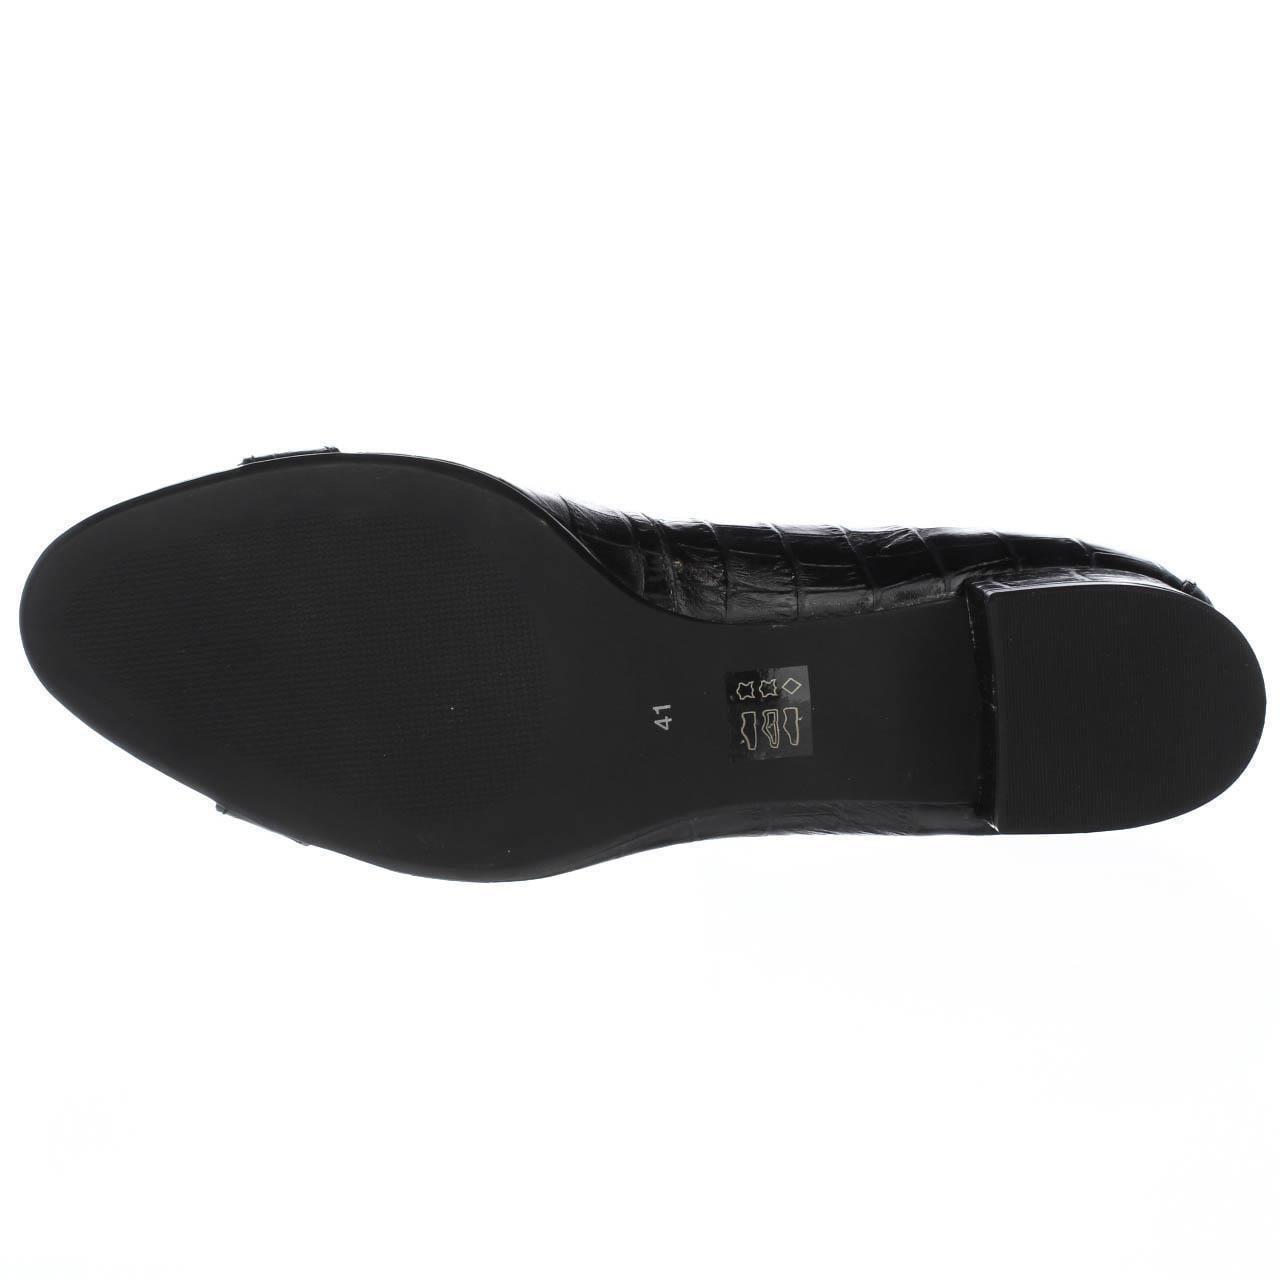 Womens Heel Marc Joseph Madison Pump Kitten Heel Womens Dress Pumps, Black Croco 748eec